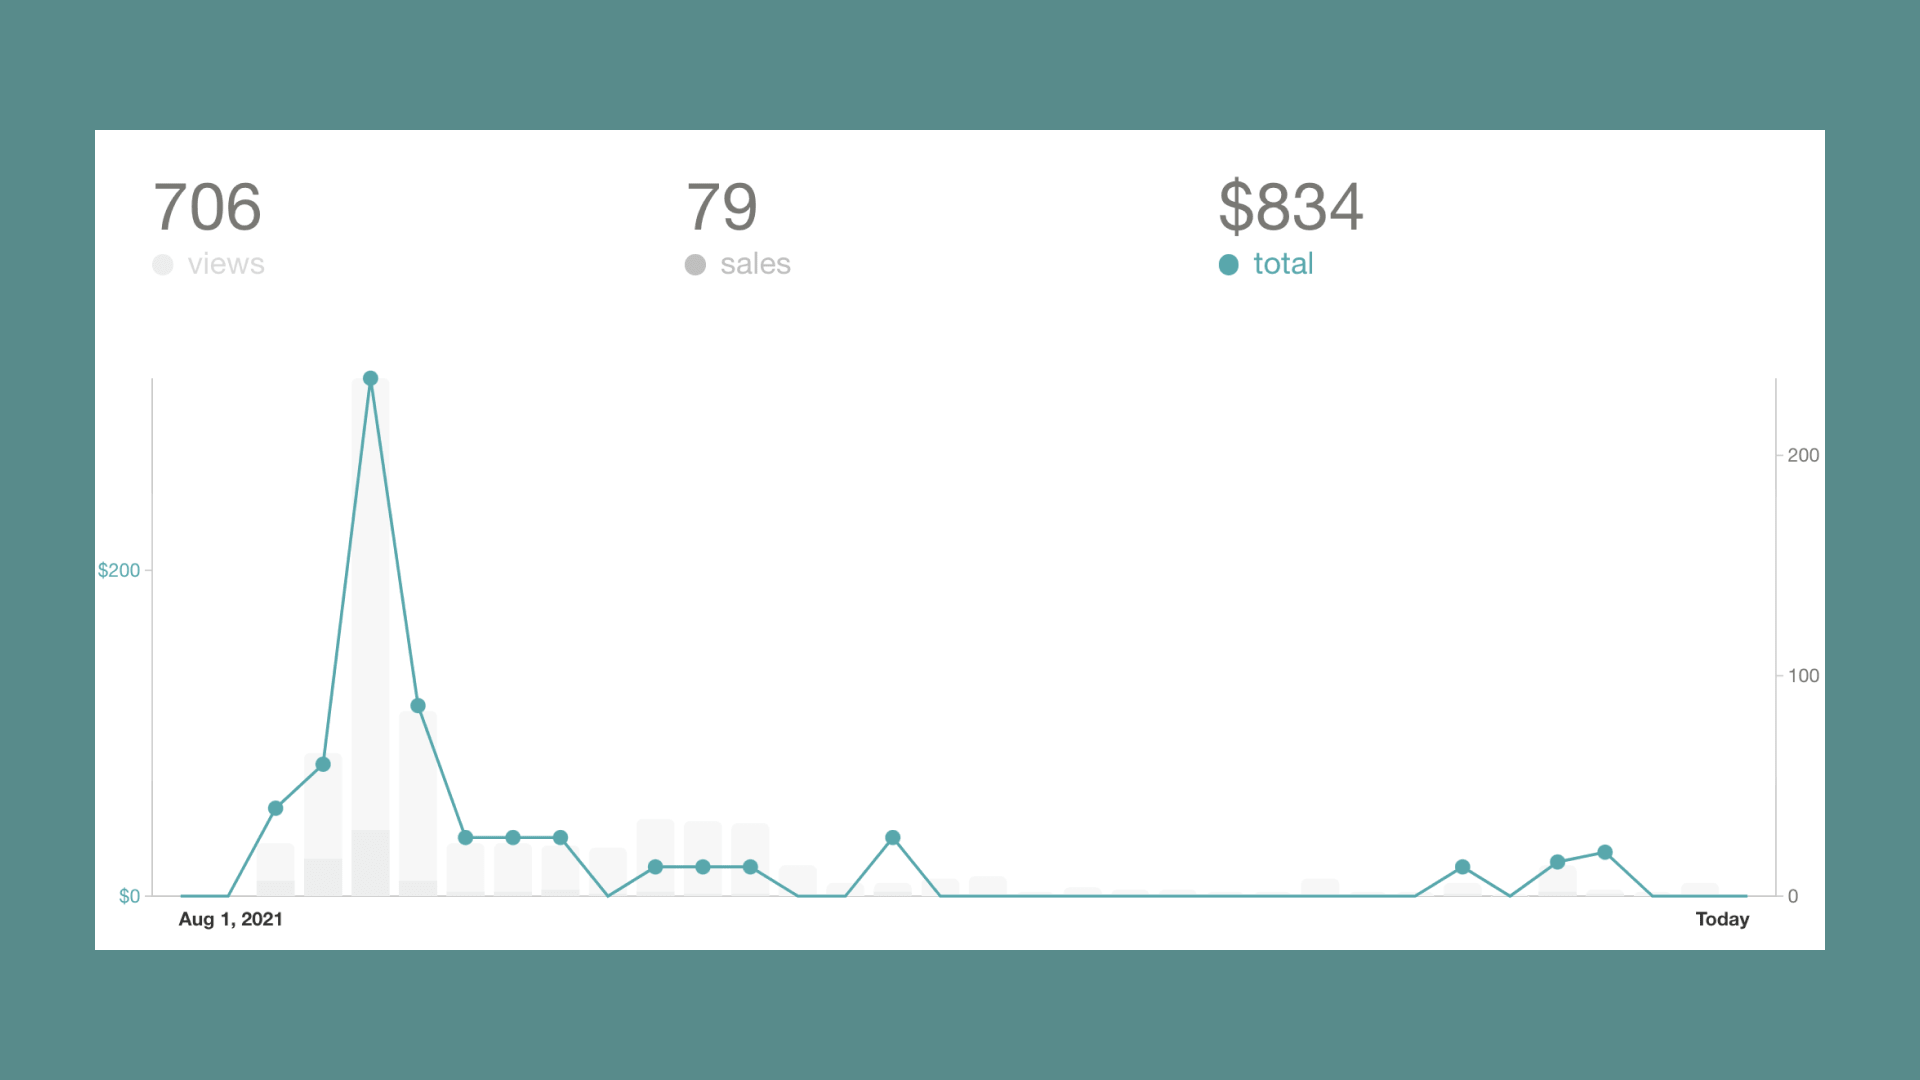 Kevon's 1st info product sales